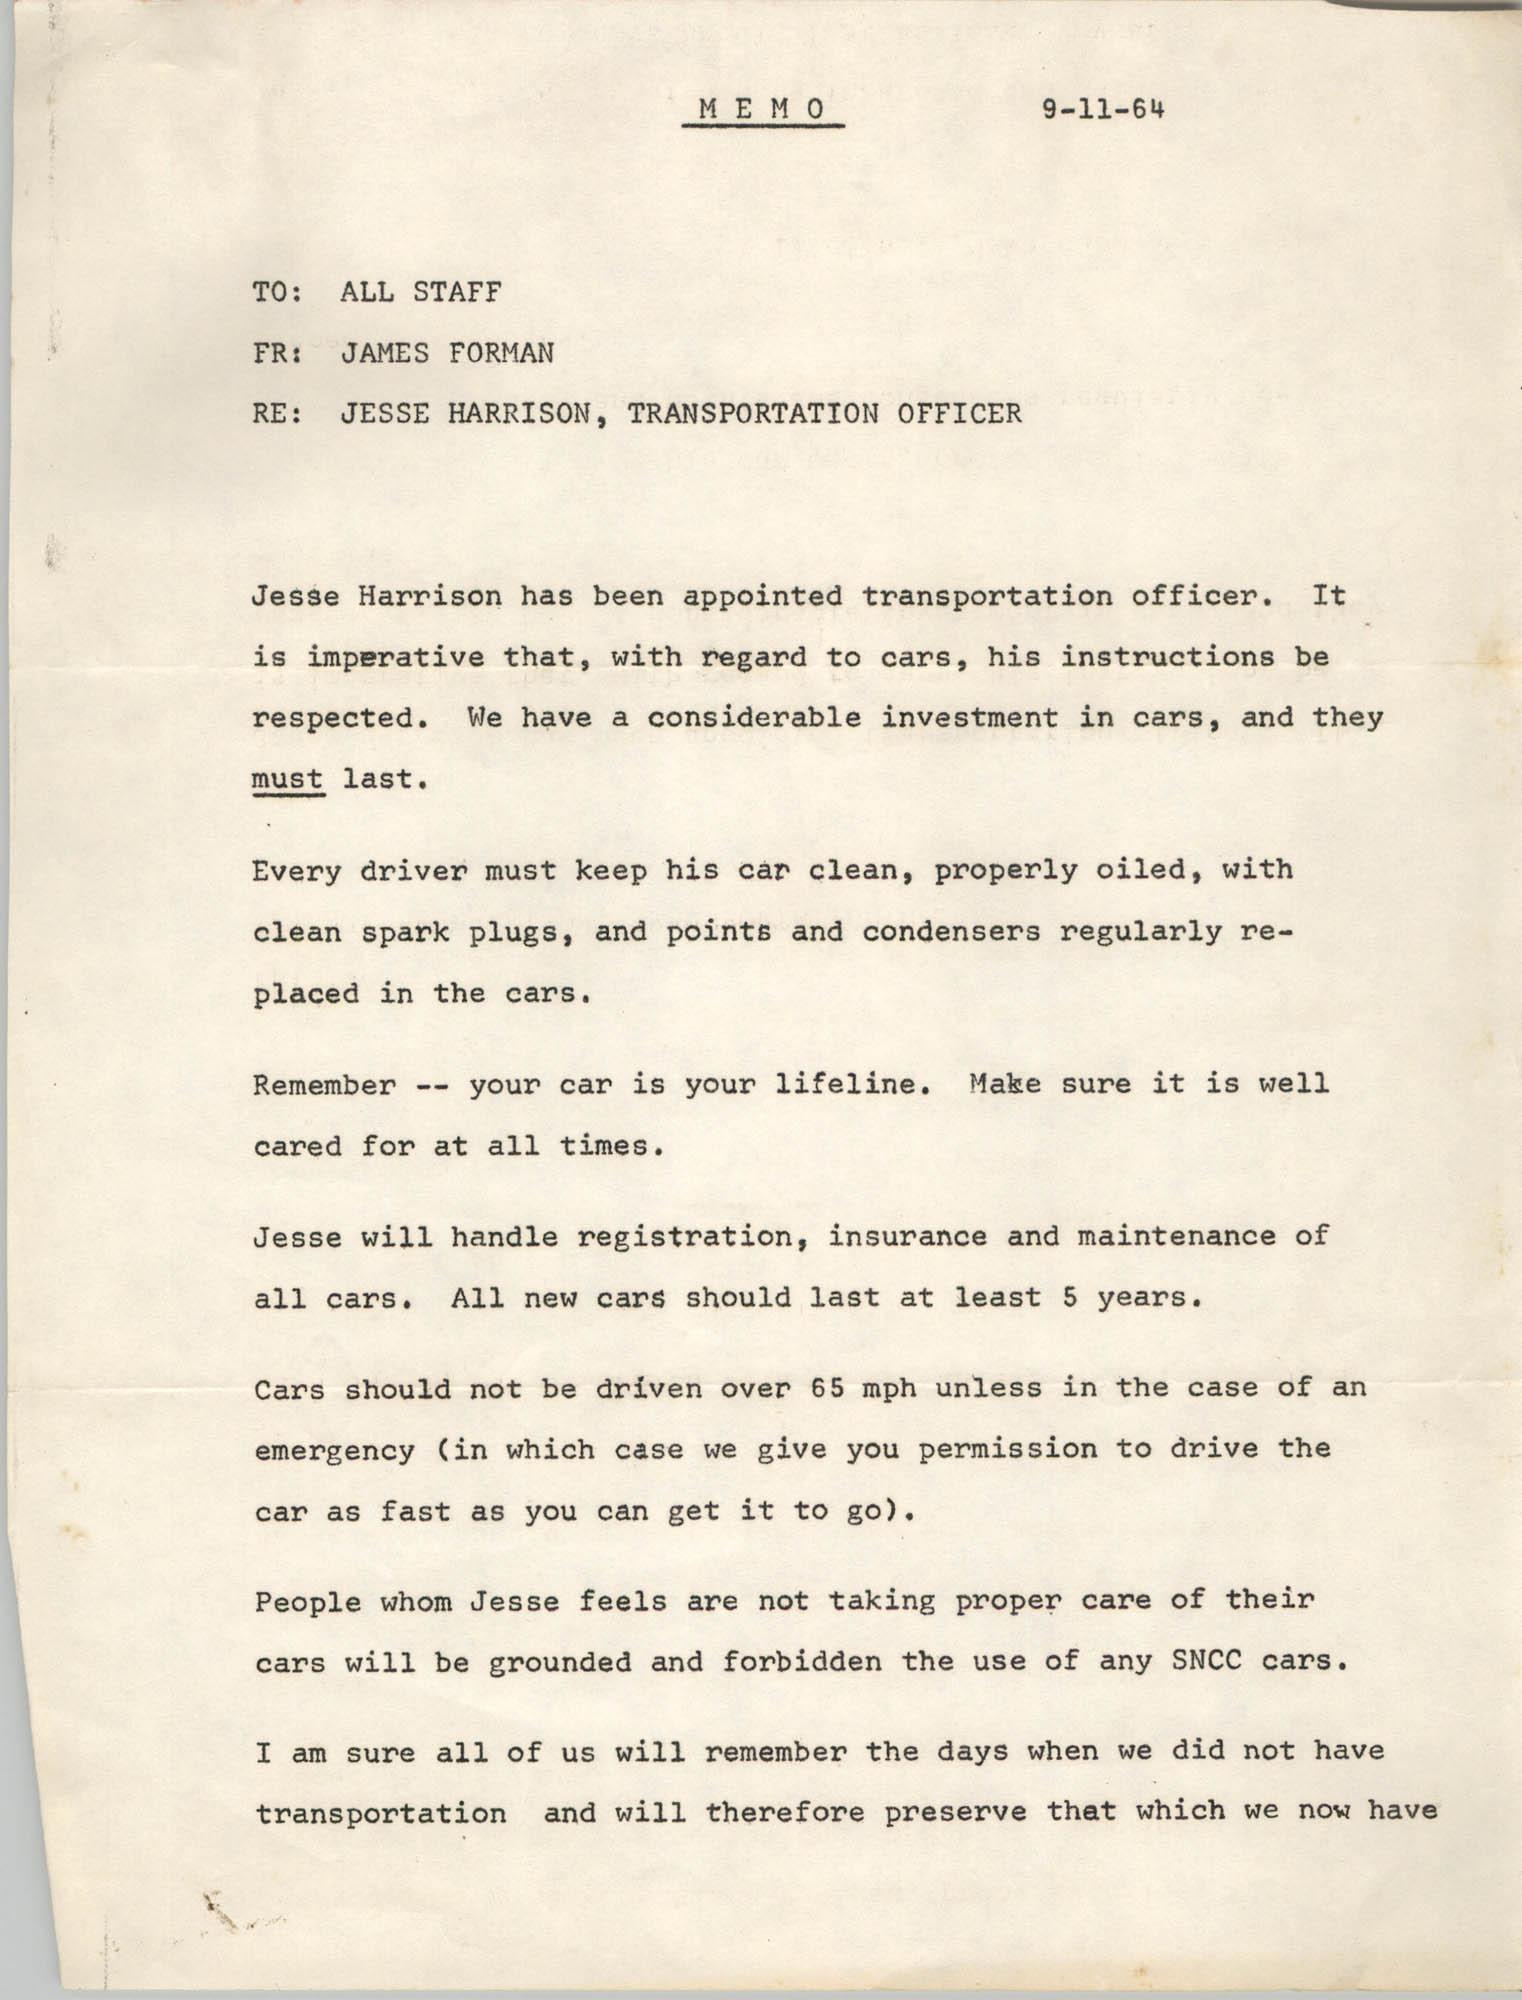 Memorandum from James Forman to All Staff, September 11, 1964